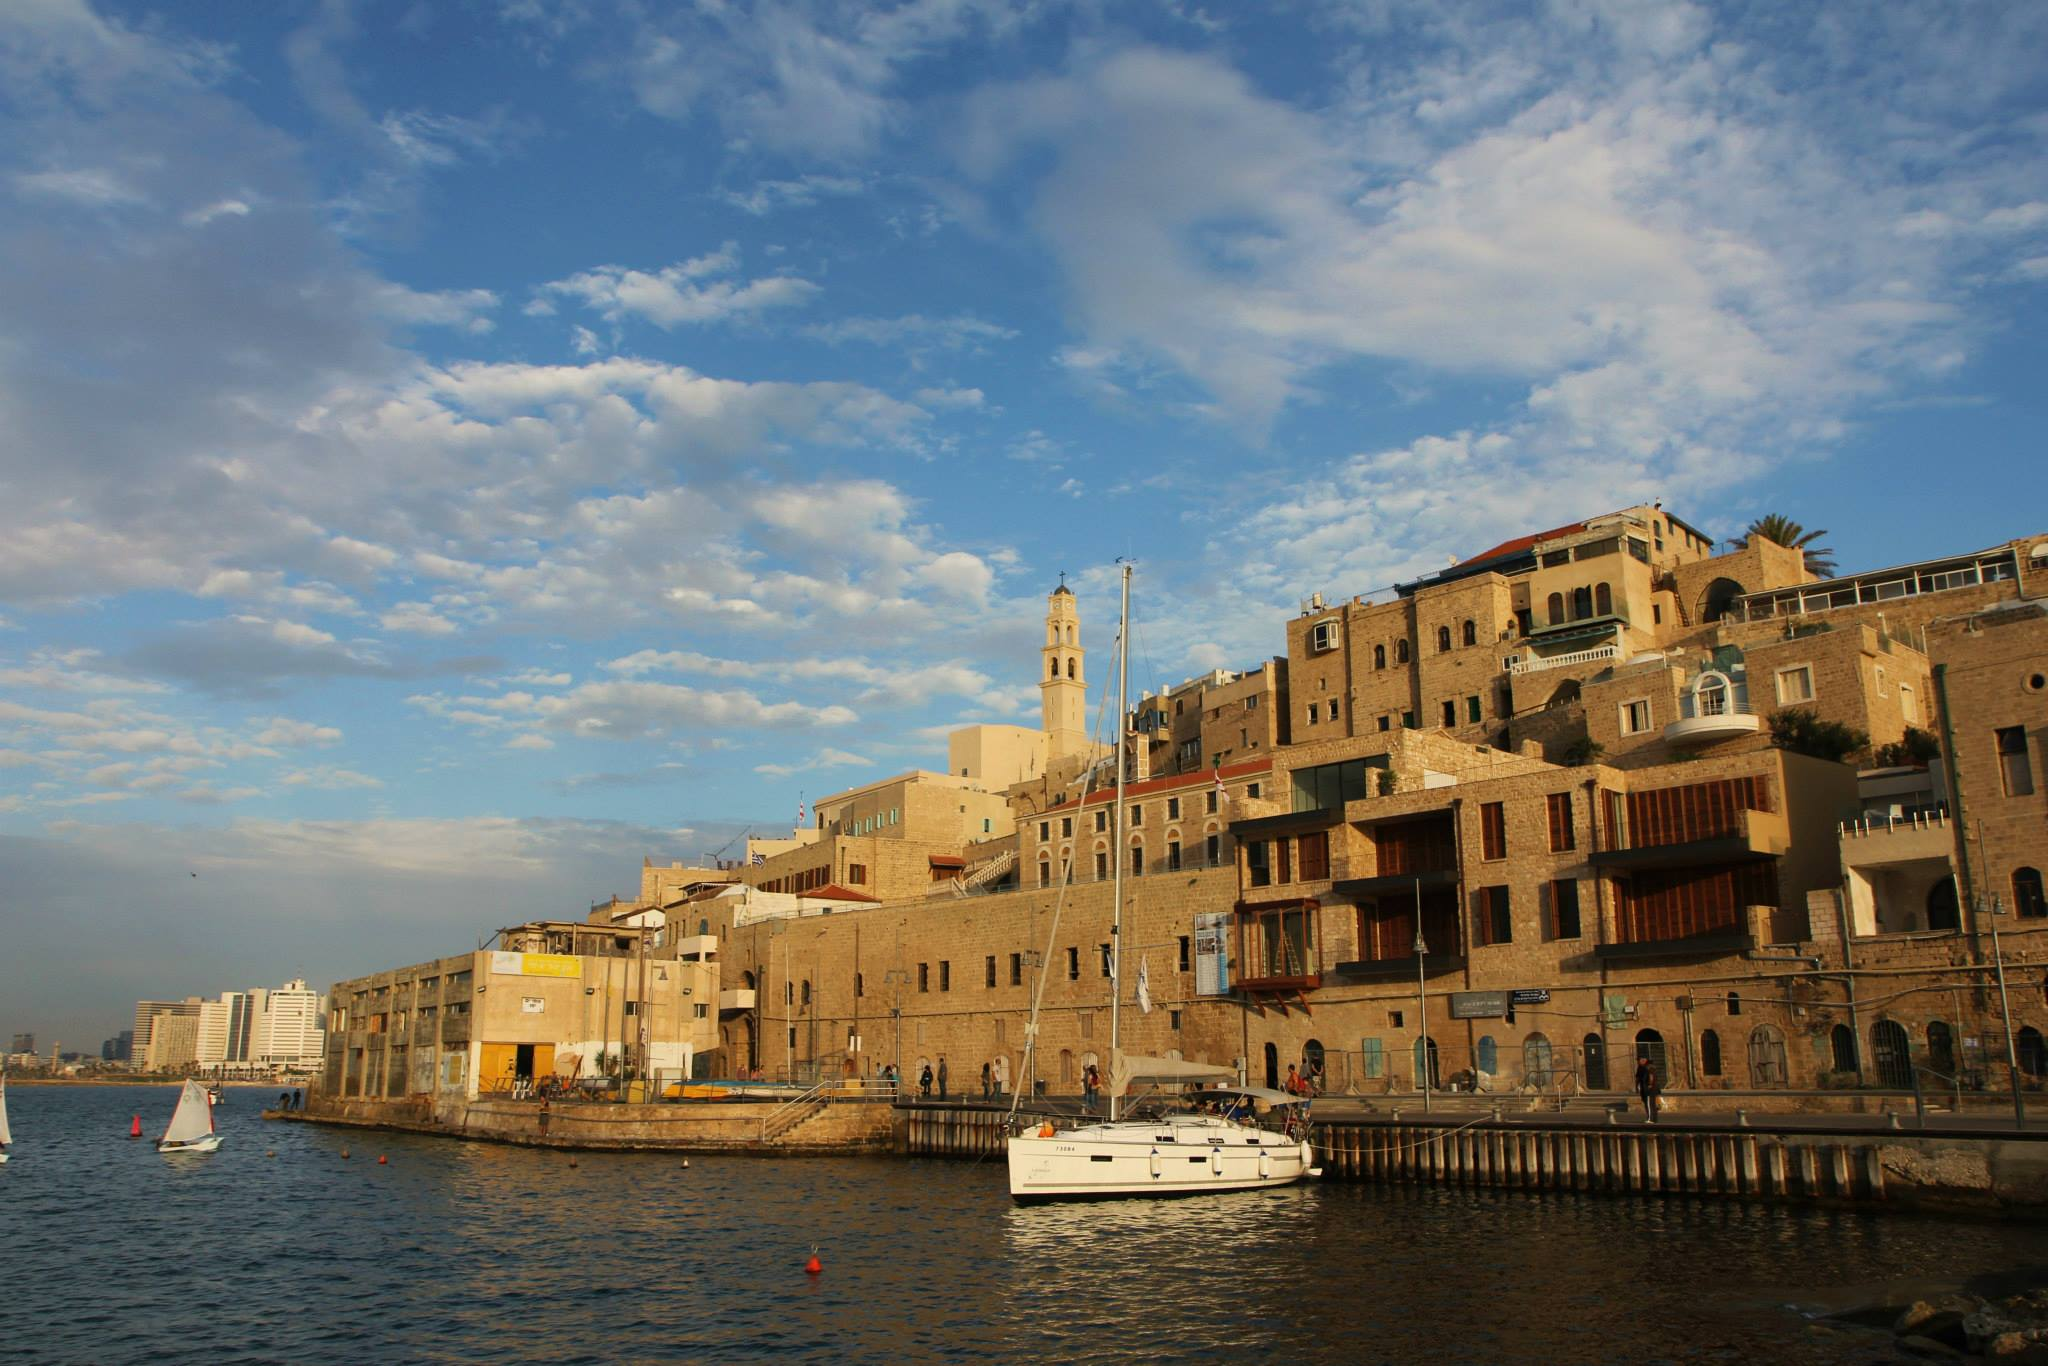 De oude haven van Jaffa in Tel Aviv